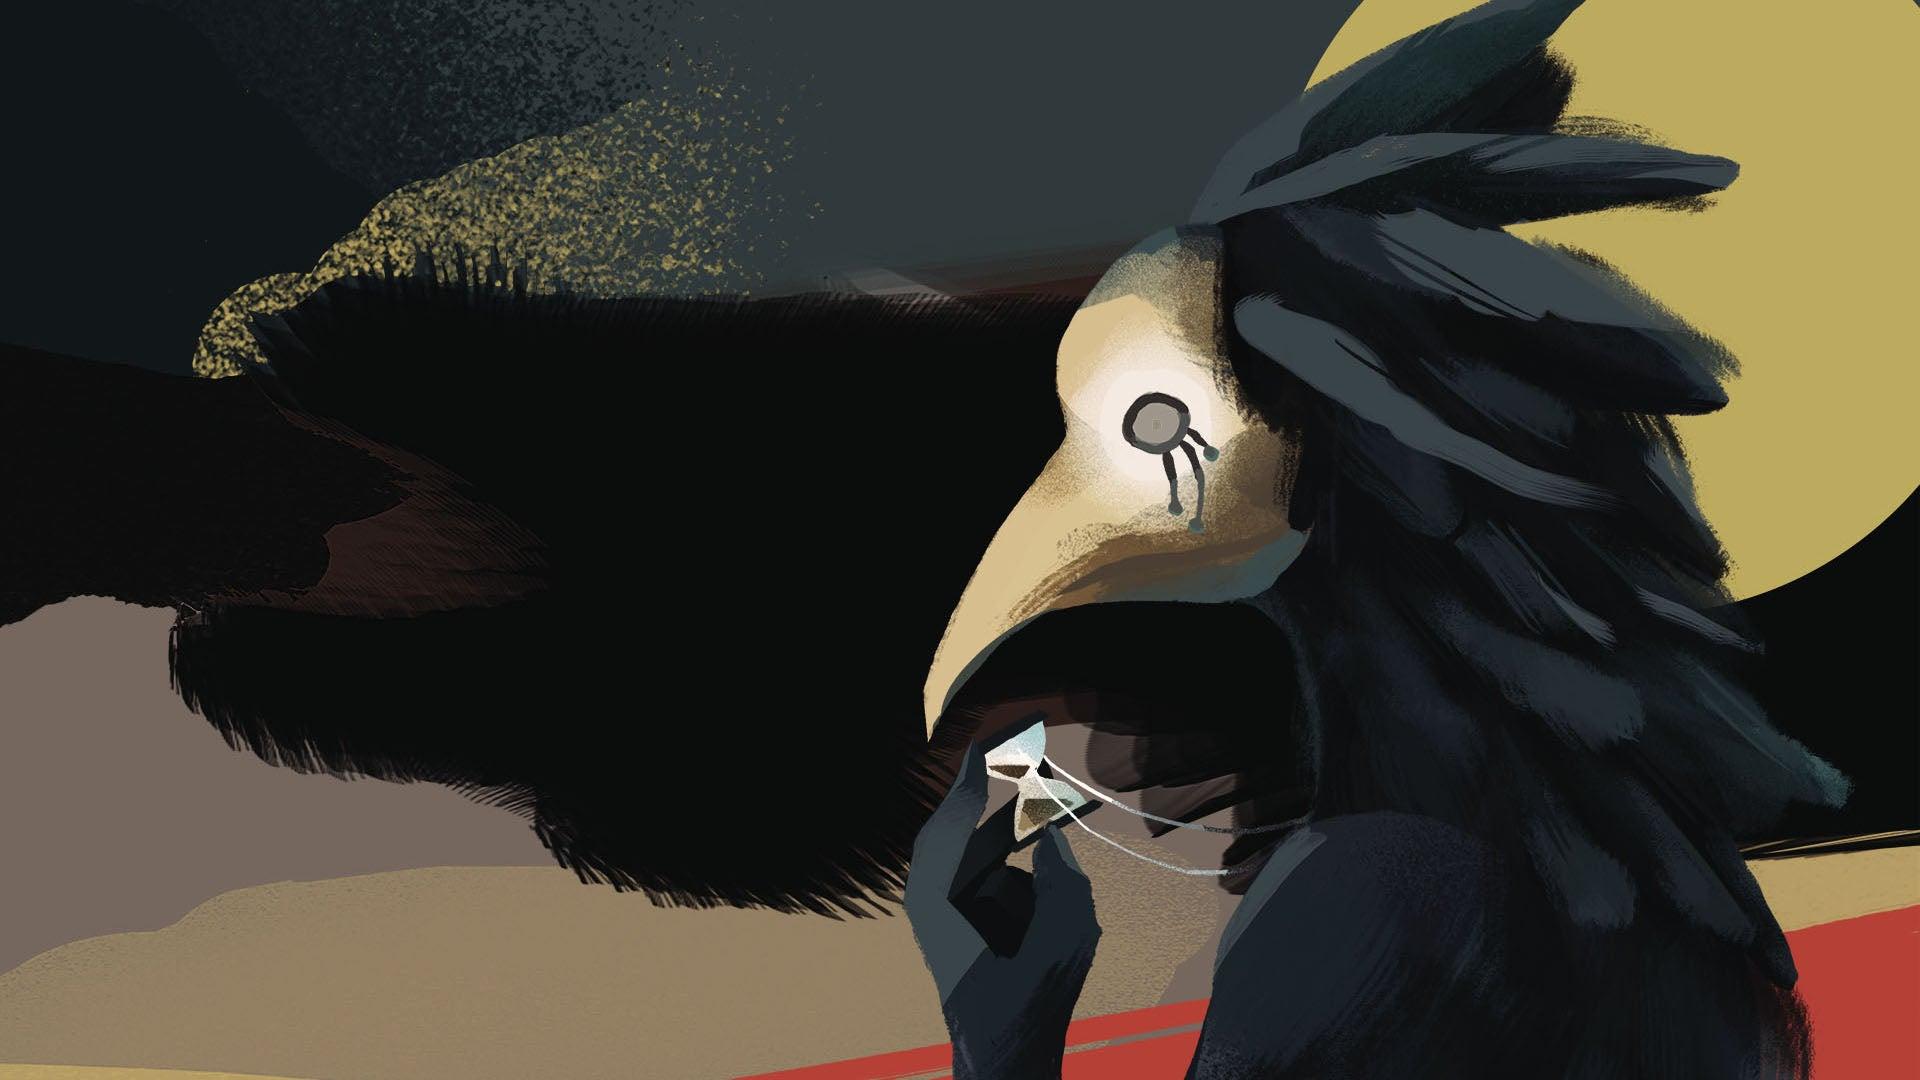 arc-rpg-artwork-beast.jpg